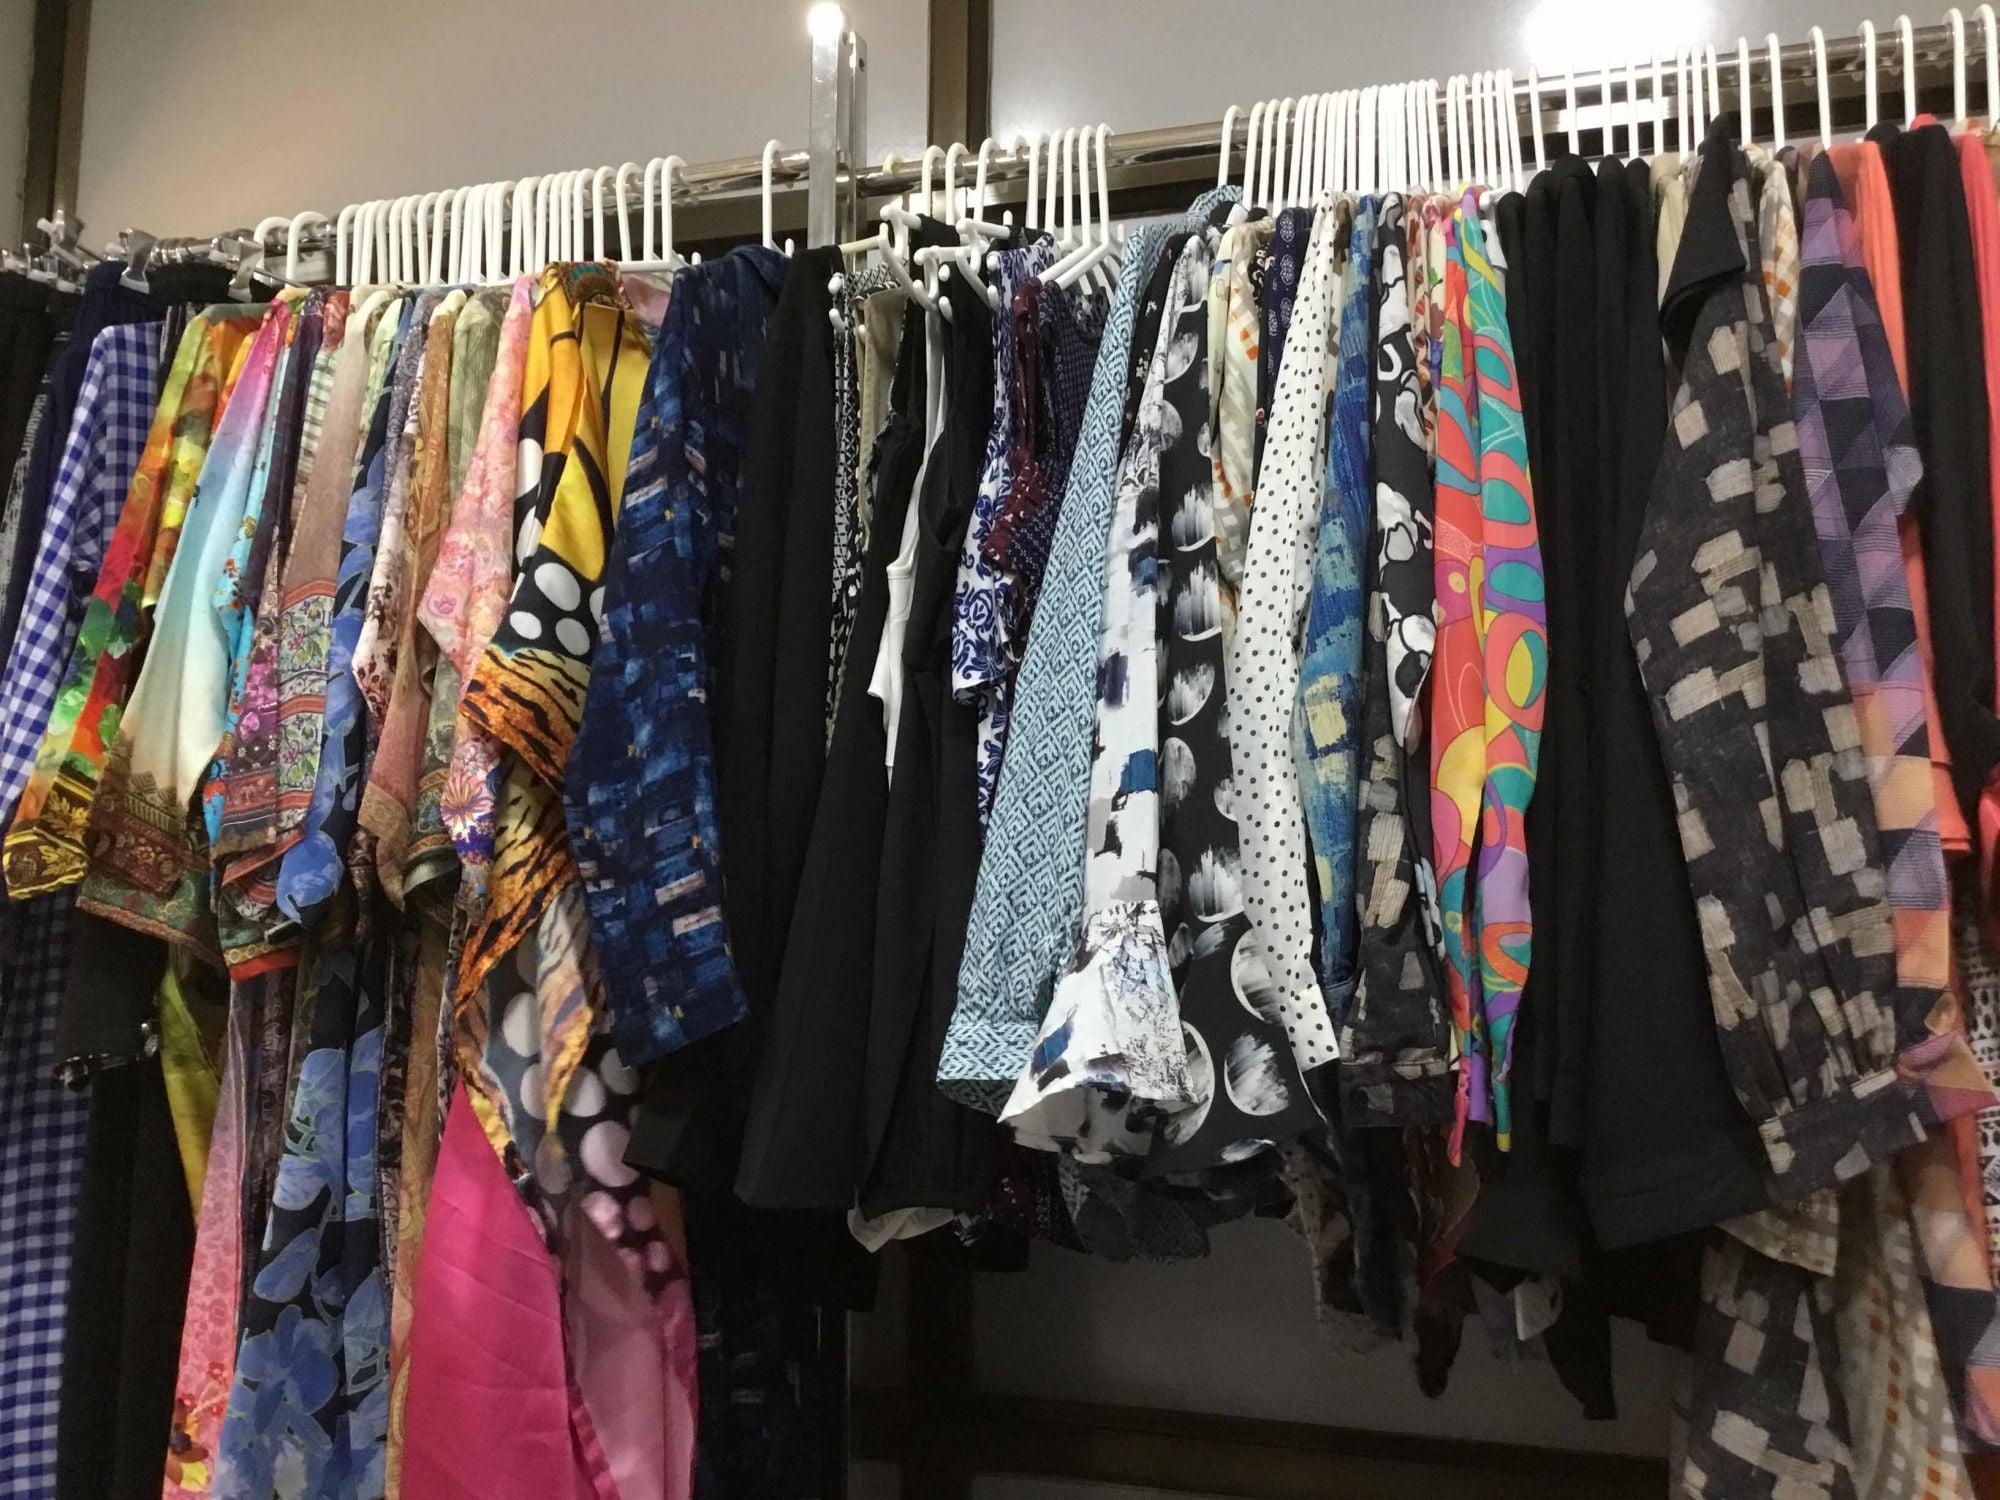 c2b9f03db85802 Top Ladies Readymade Garment Wholesalers in Surat - Best Women ...